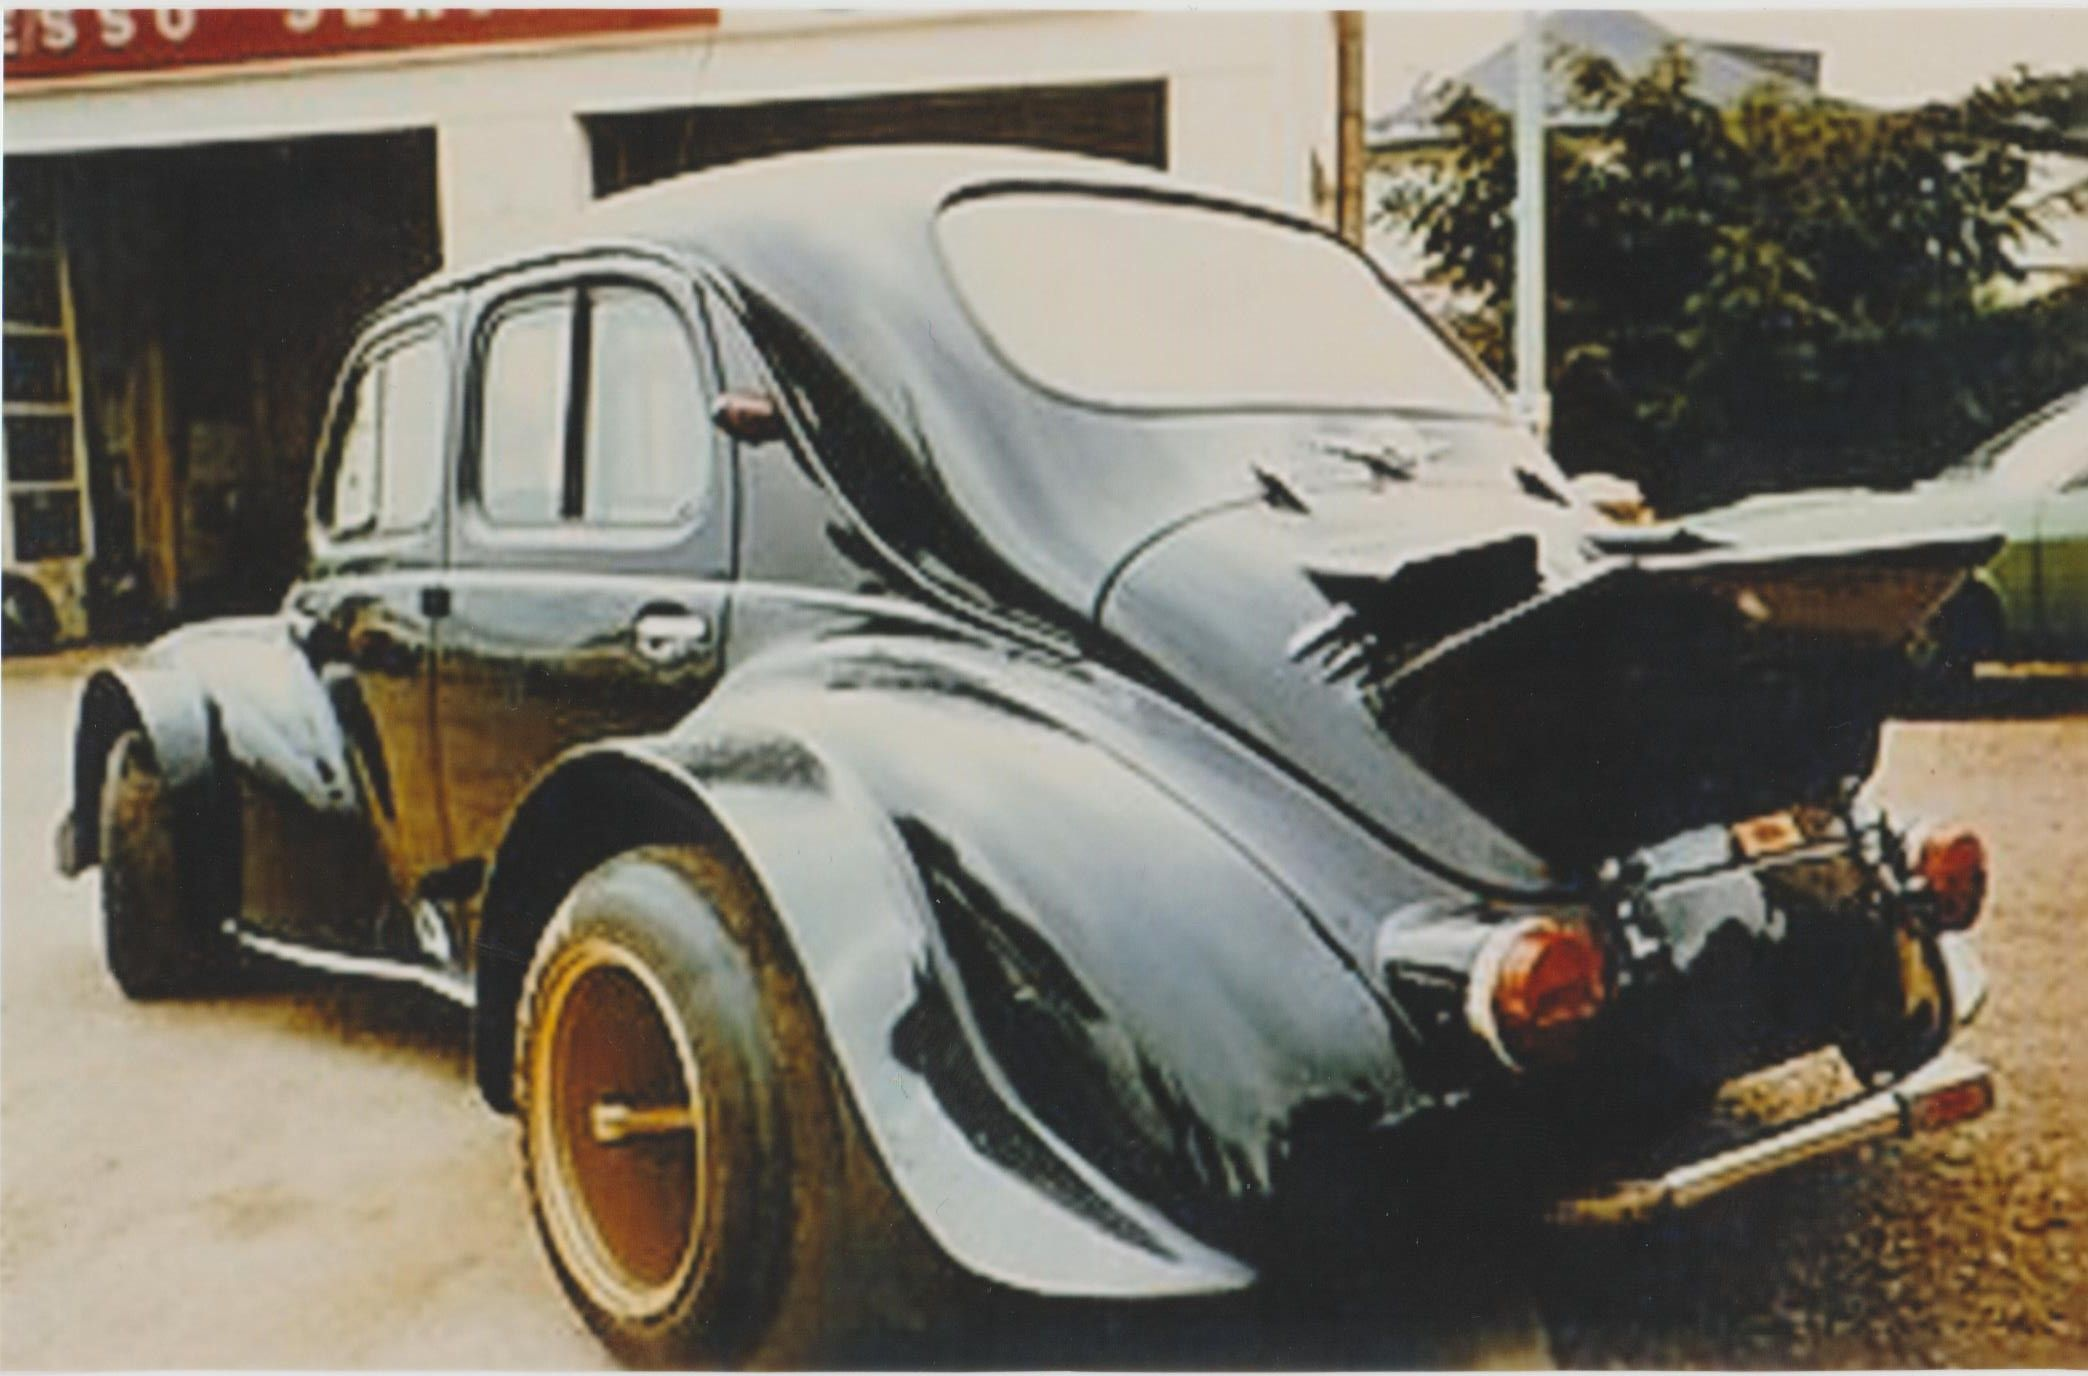 4 Cv Proto Inconnu Voiture Vintage Voiture Belle Voiture